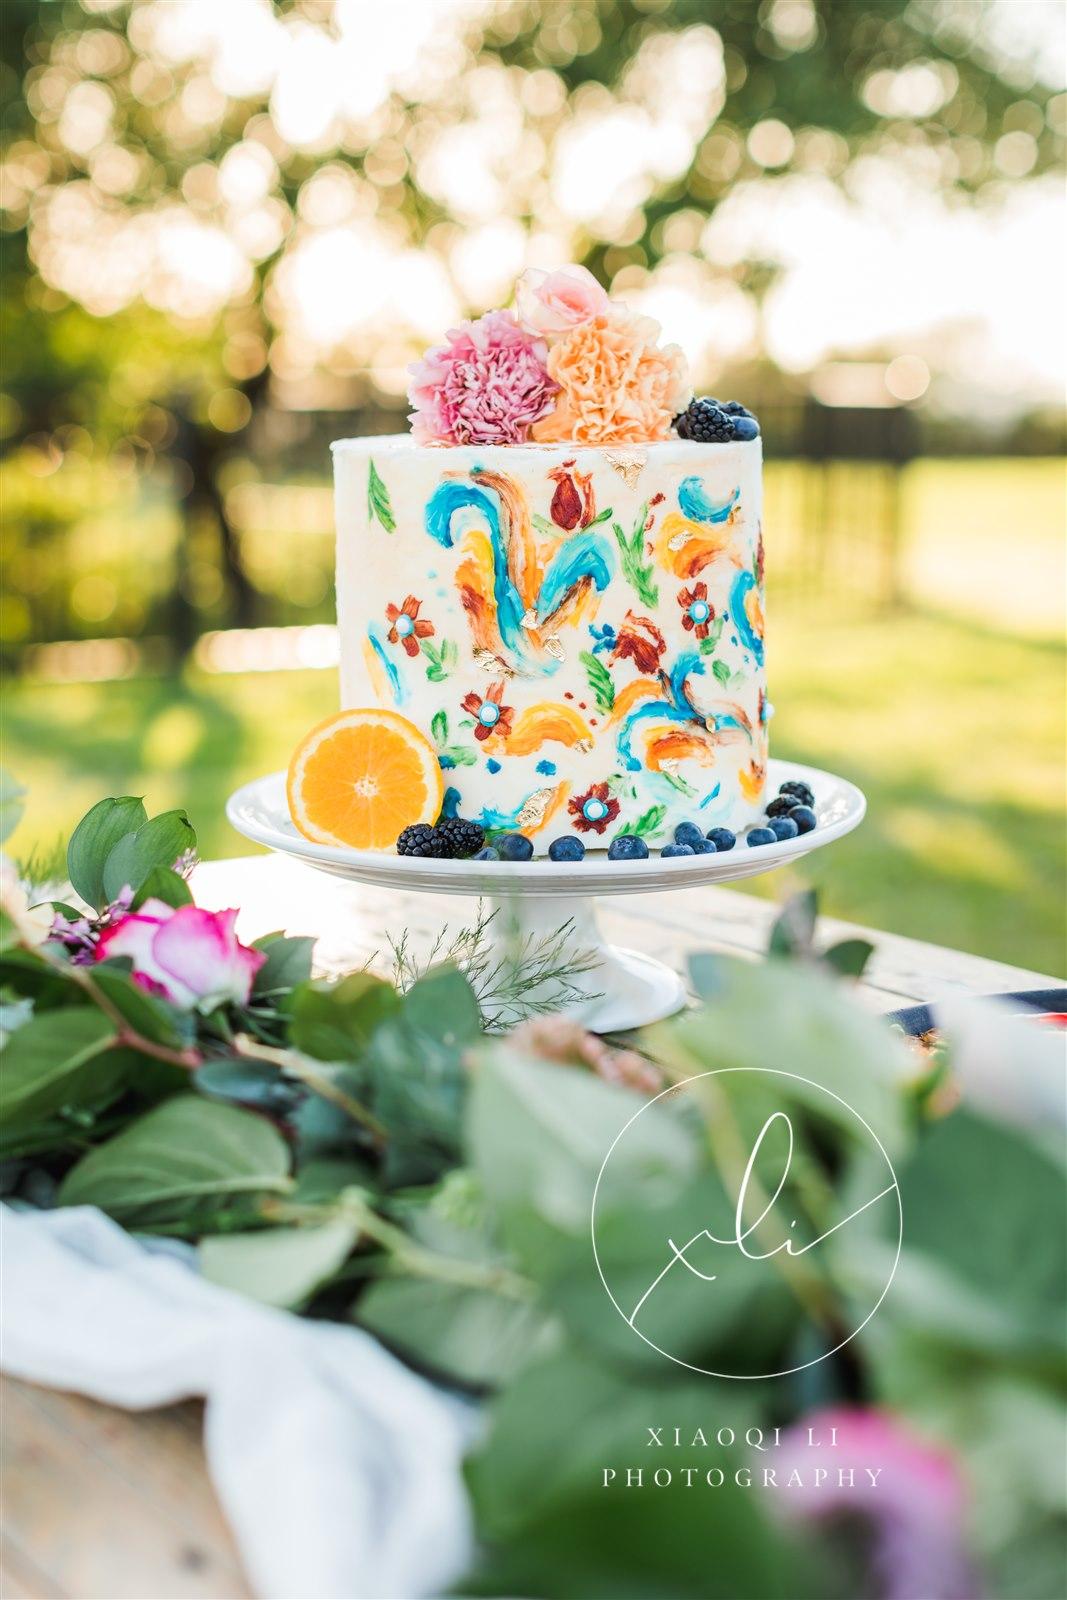 Xiaoqi-Li-Photography-Vendors-San-Antonio-Spanish-Inspired-Styled-Wedding-Gallery-119.jpg